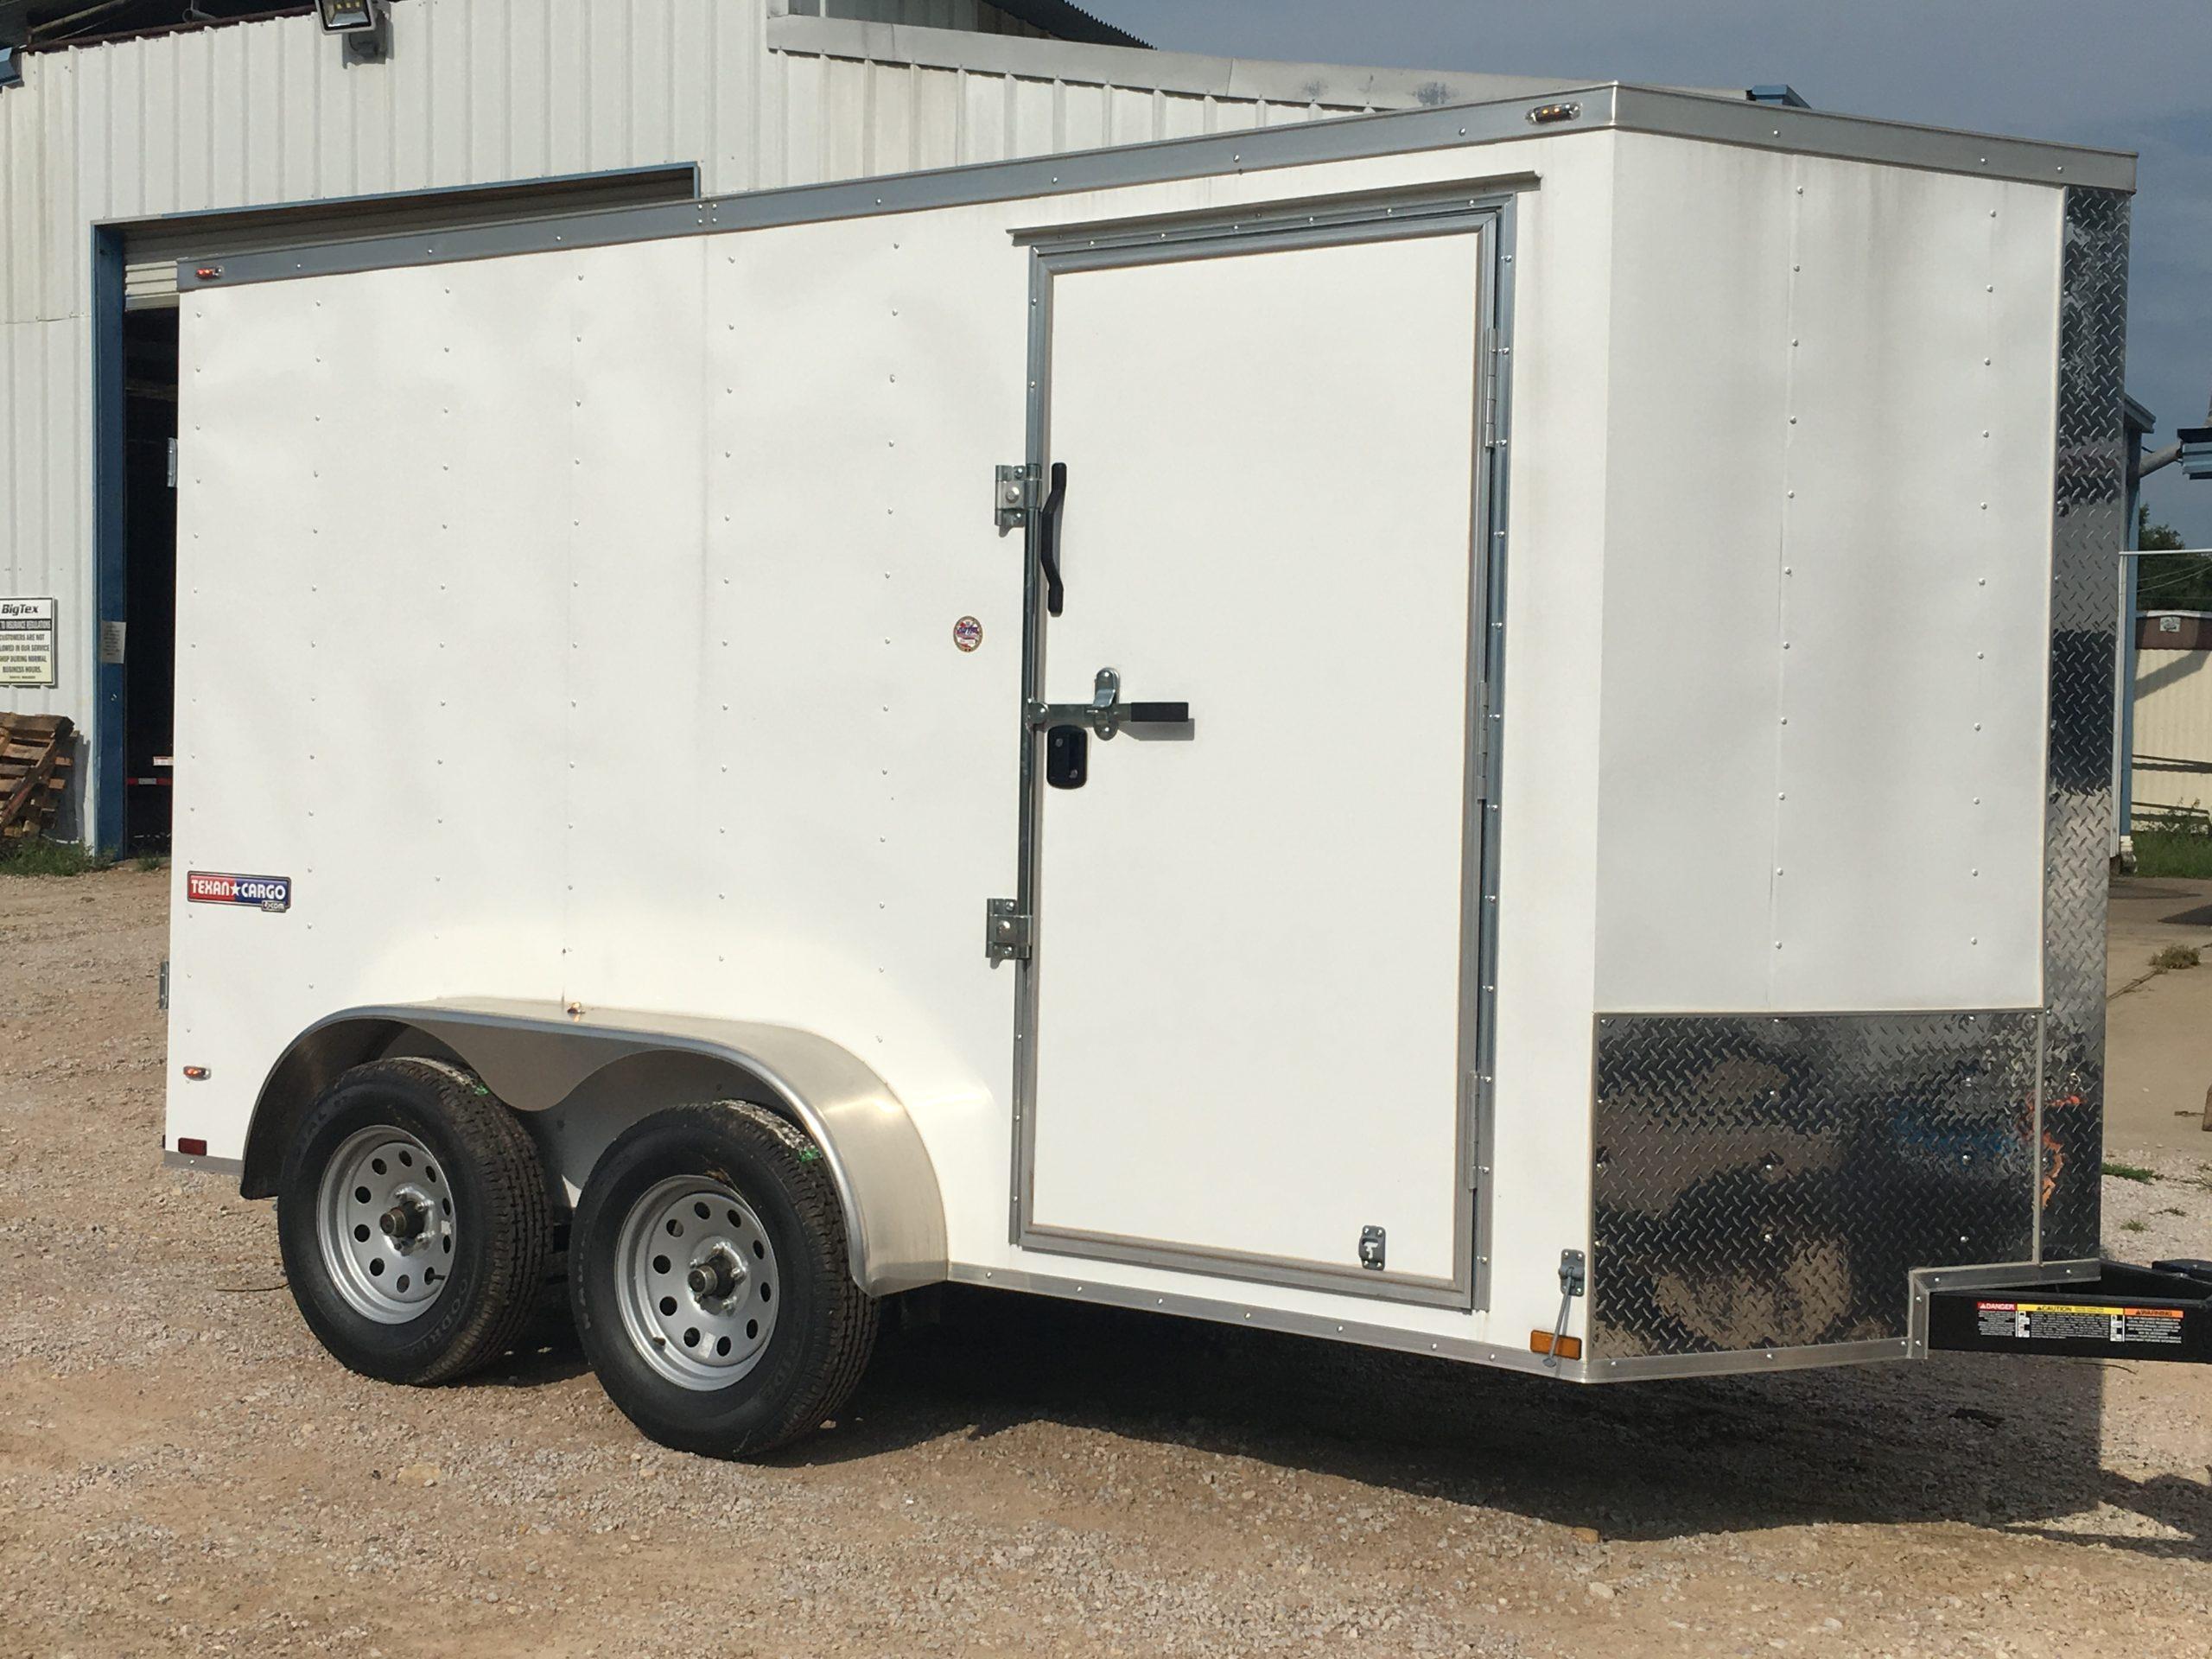 Millenia trailer